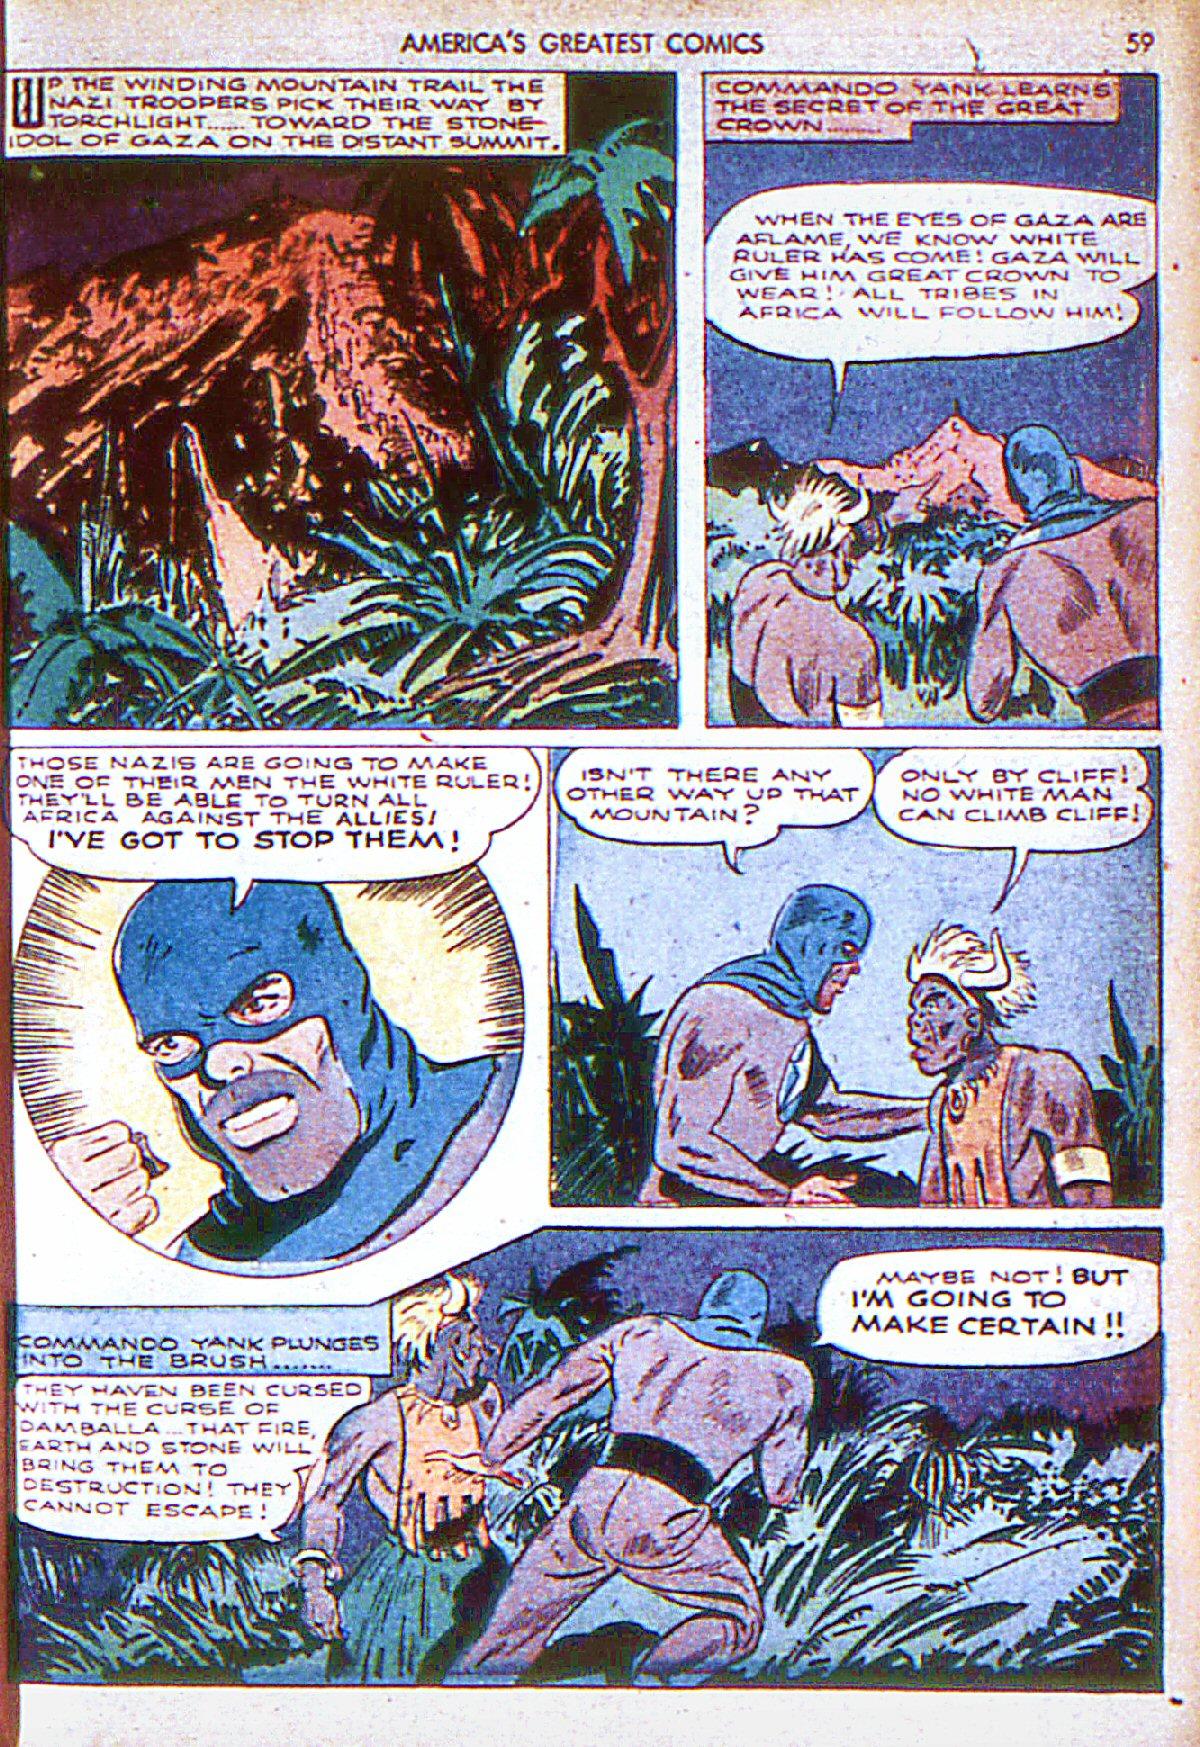 Read online America's Greatest Comics comic -  Issue #6 - 60